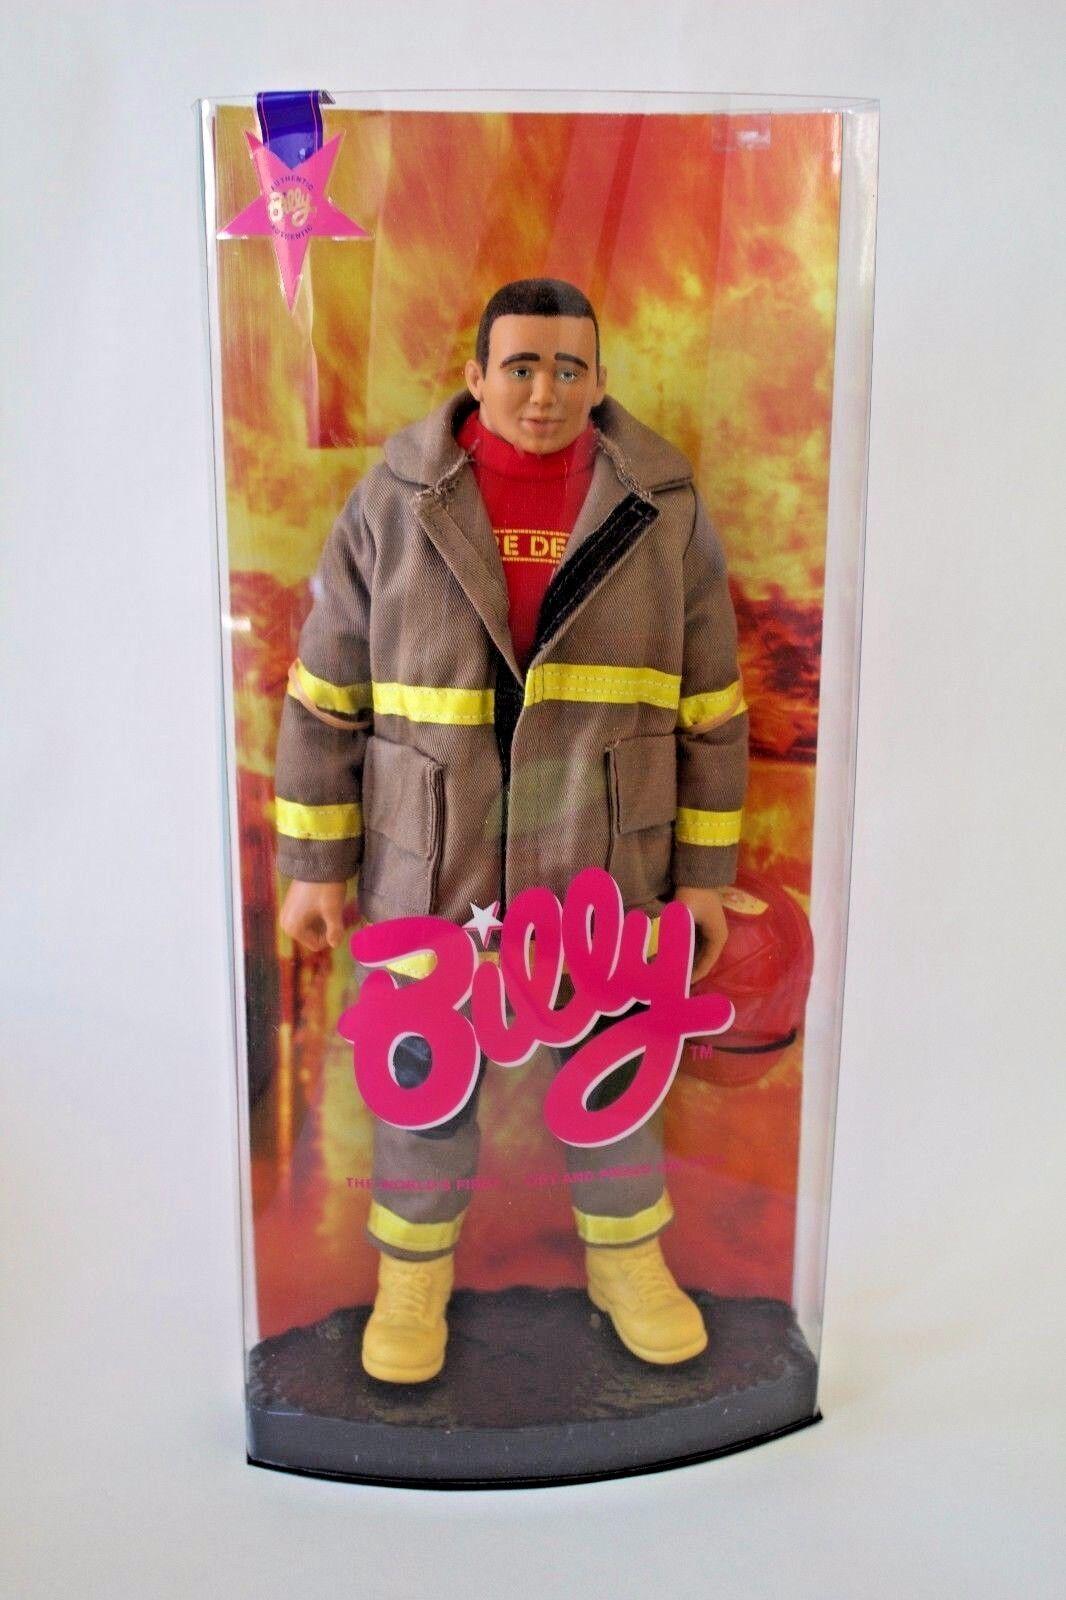 Billy Muñeca Morena Gay Menta en caja botas de casco de Bombero Fuego Hombre Uniforme